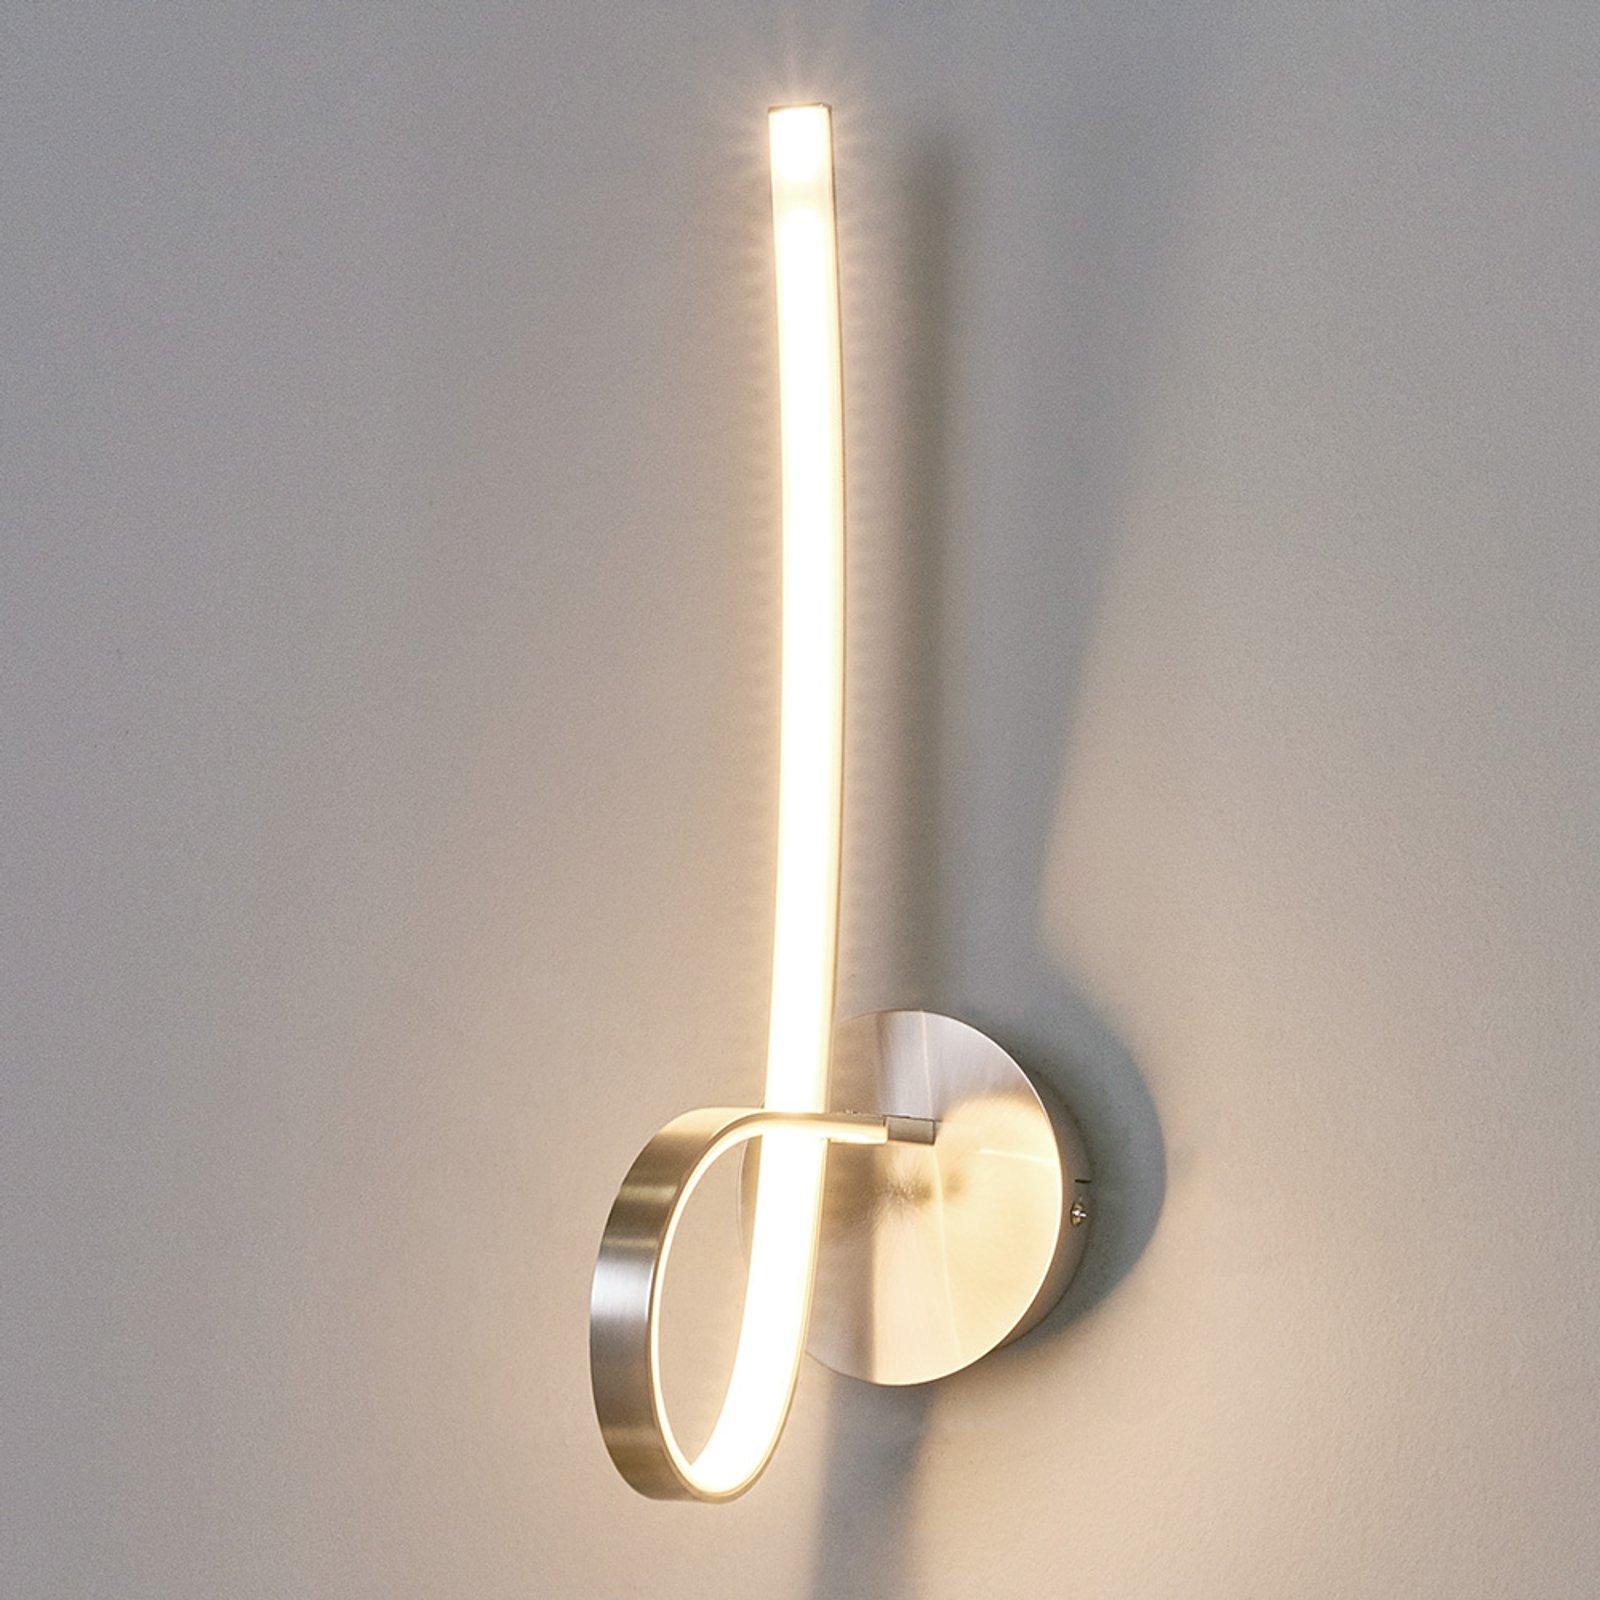 Eldin - dekorativ LED-vegglampe